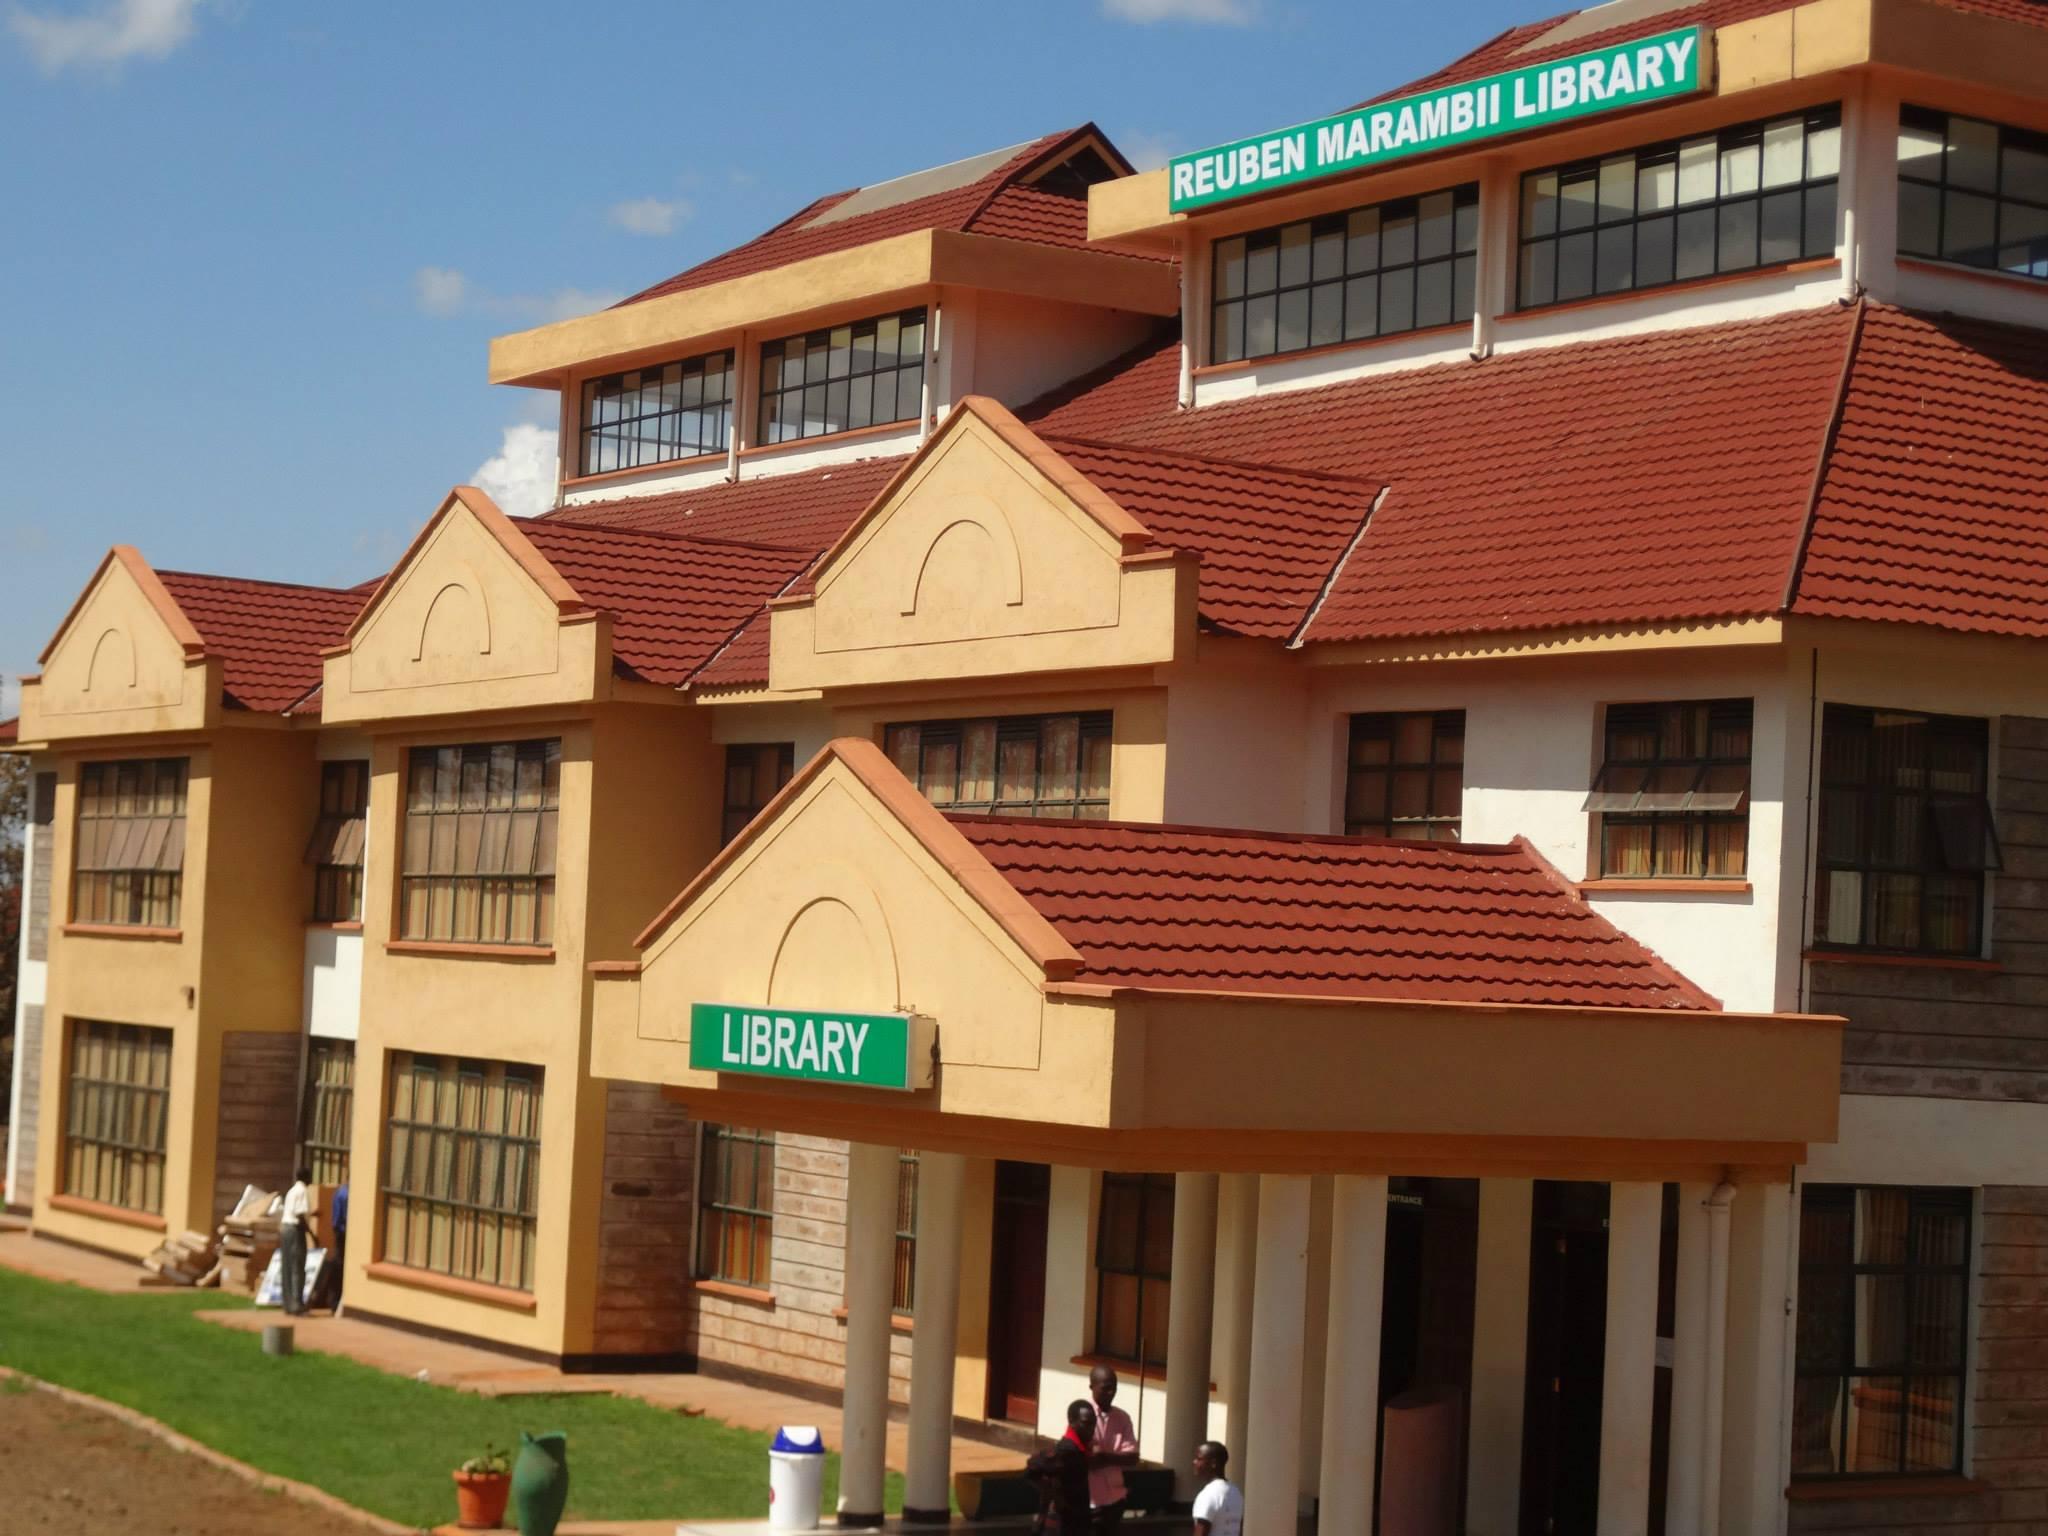 Reuben Marambii Library